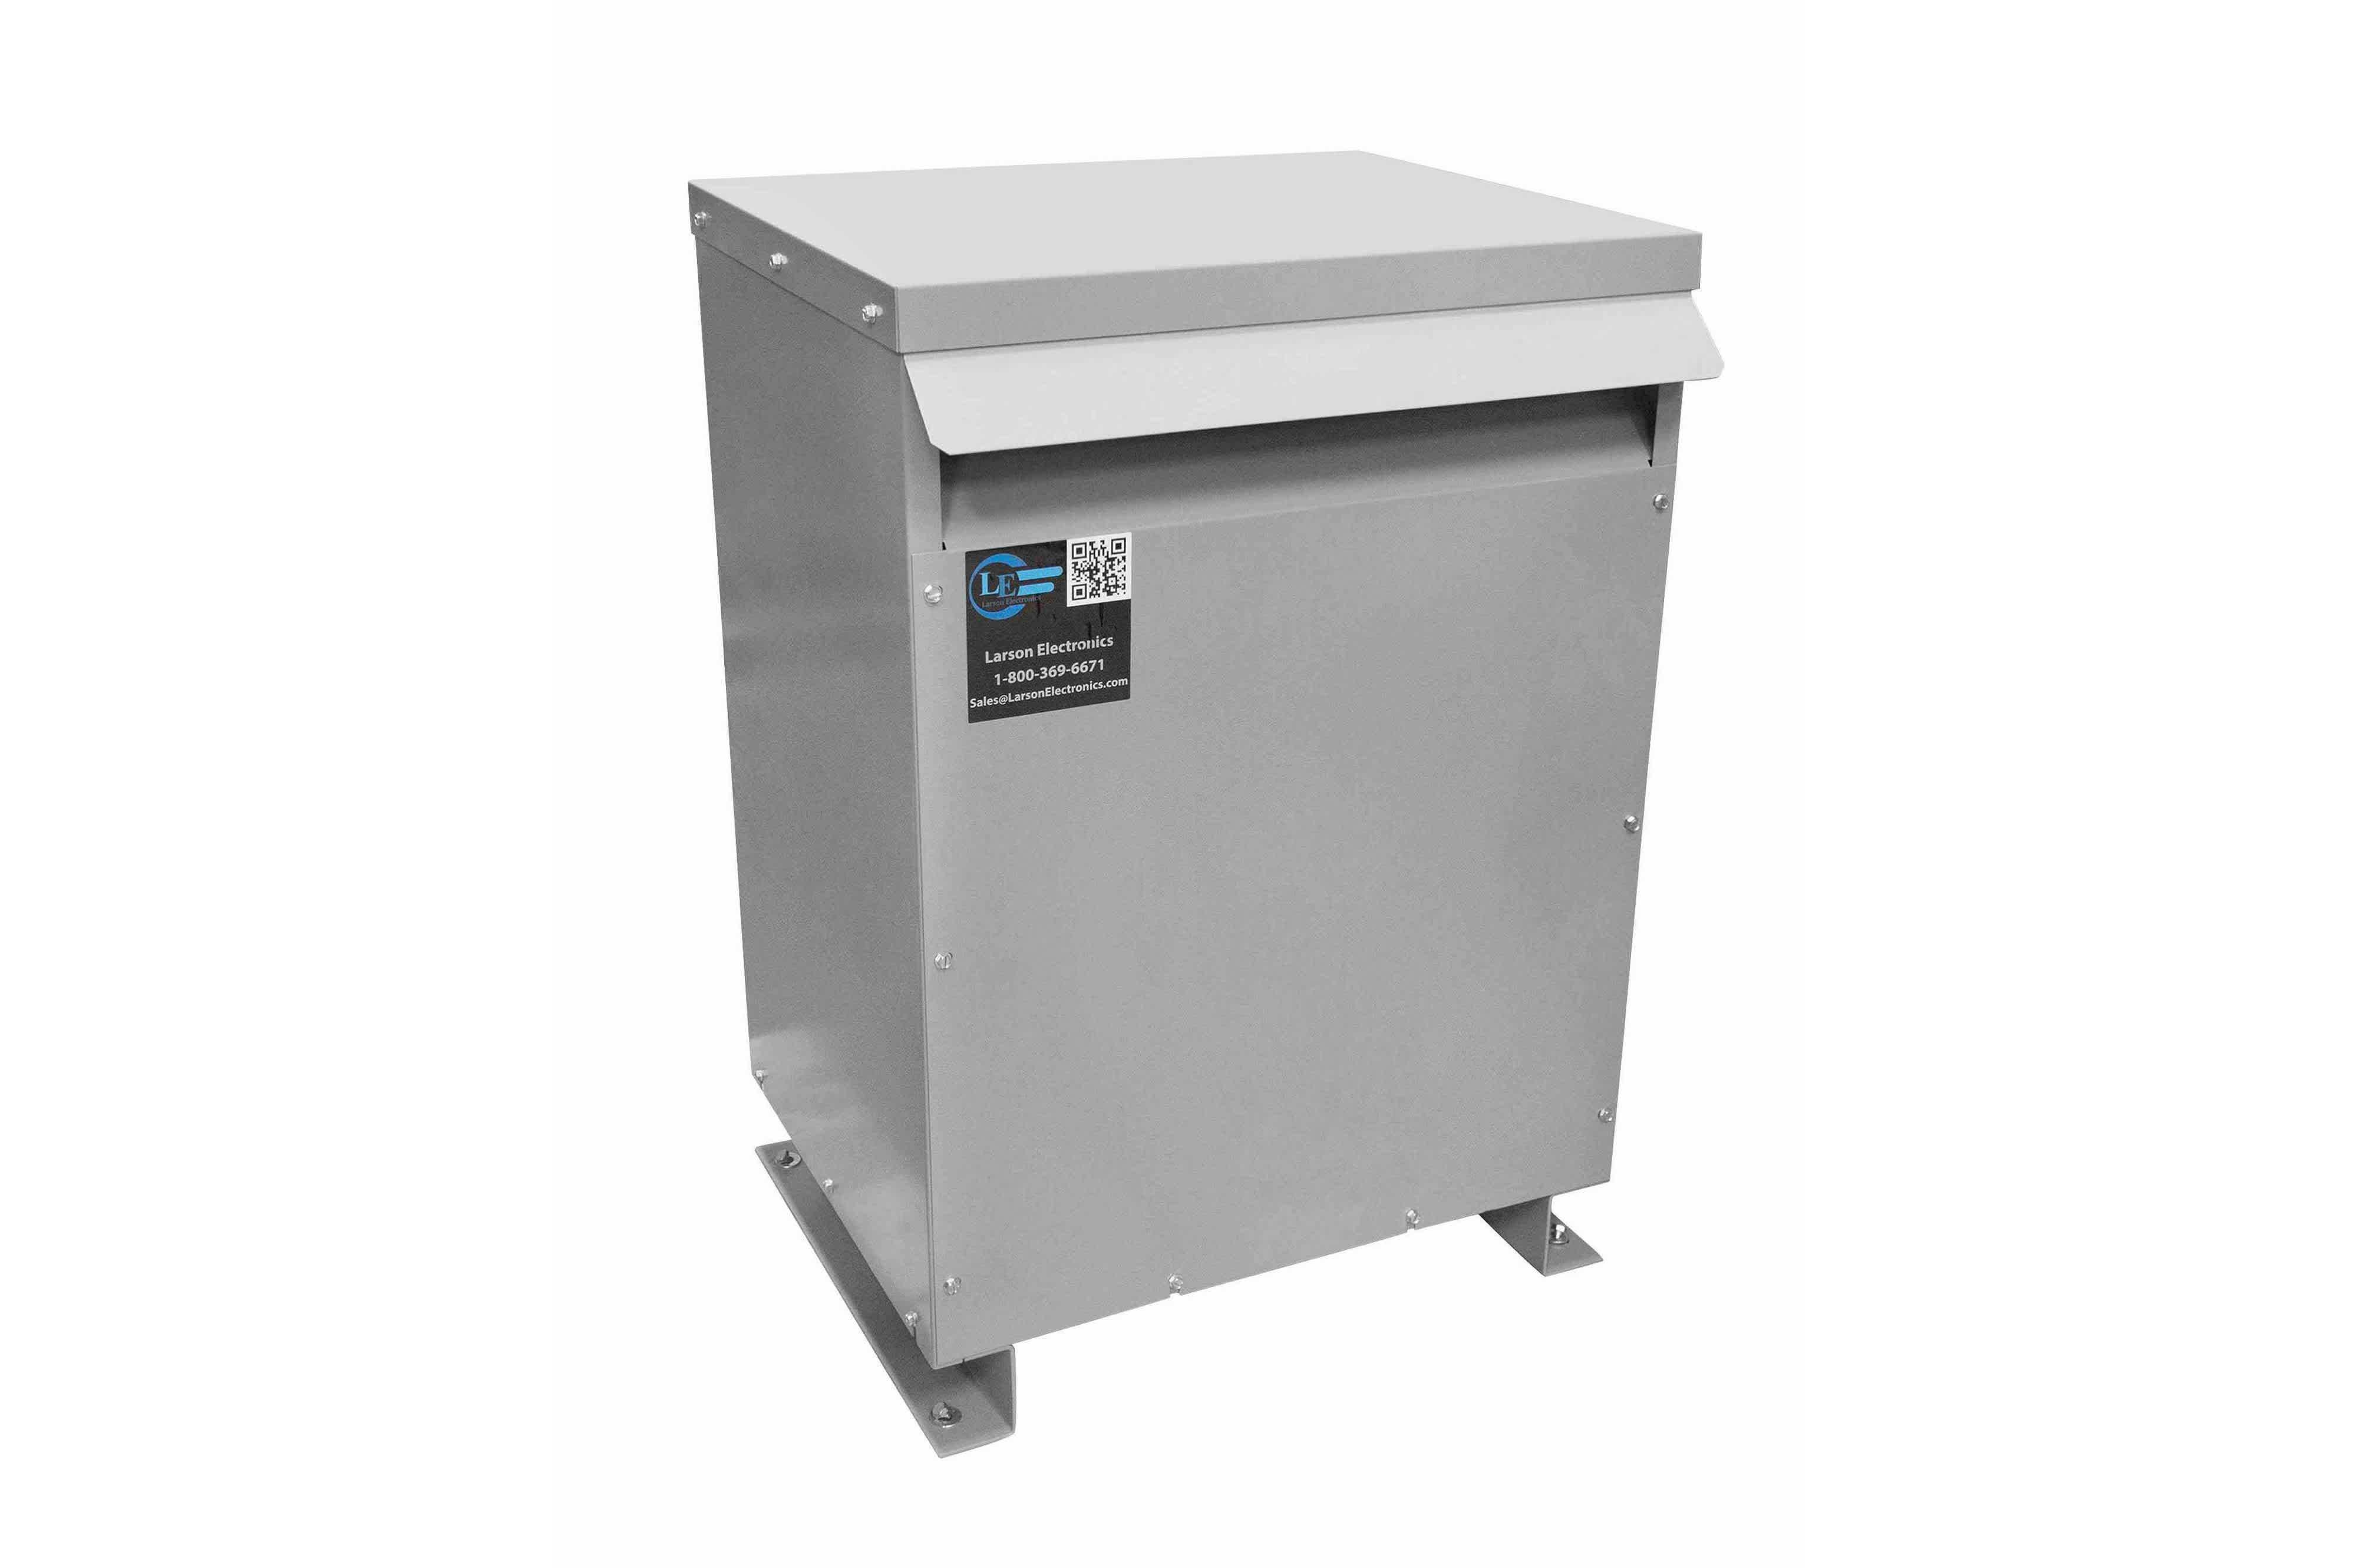 13 kVA 3PH Isolation Transformer, 460V Wye Primary, 208Y/120 Wye-N Secondary, N3R, Ventilated, 60 Hz